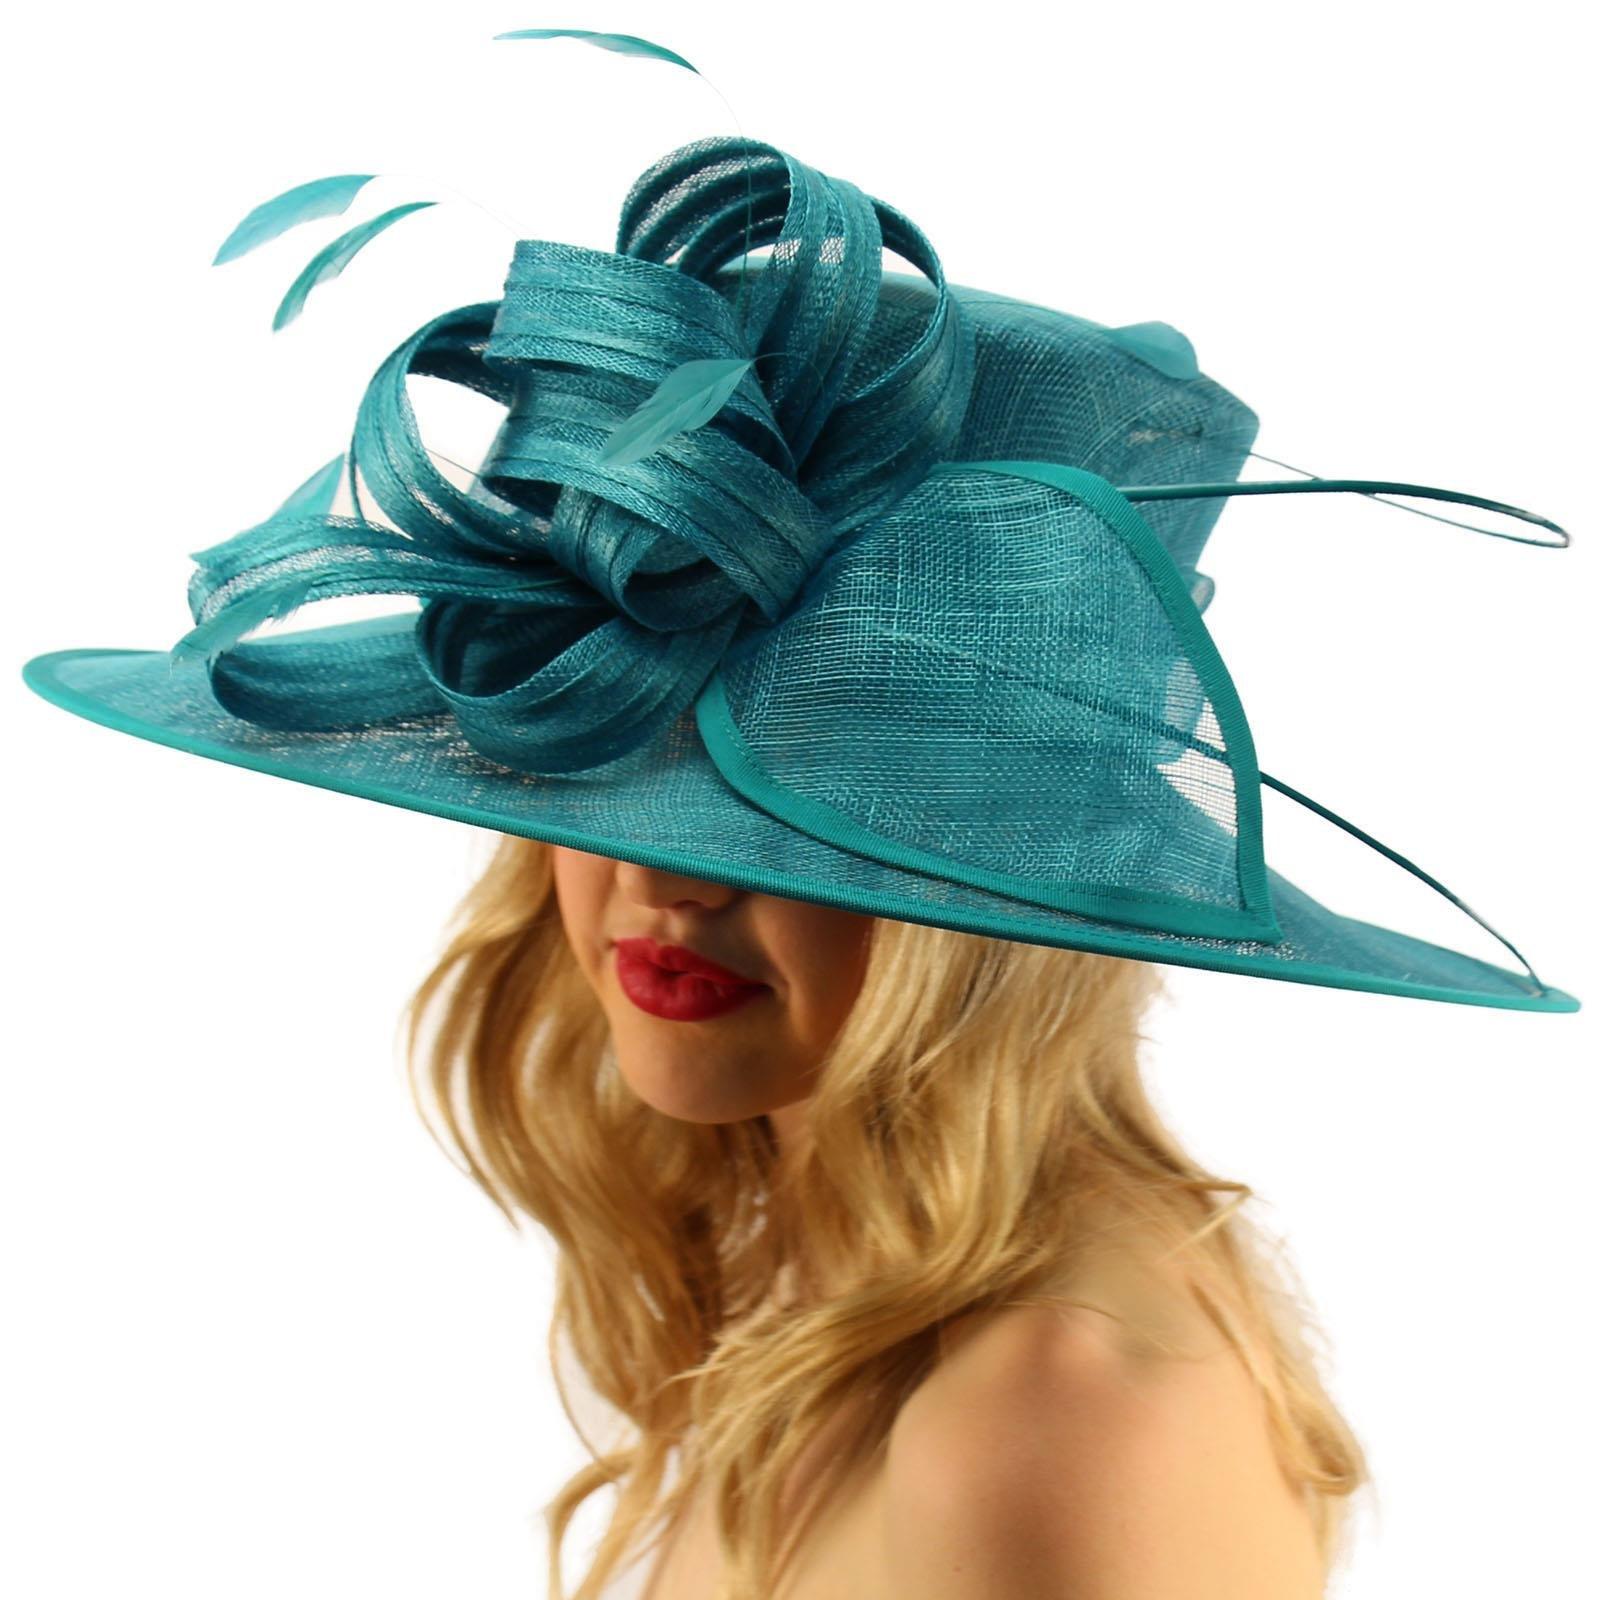 SK Hat shop British Regal Sinamy Ribbon Feathers Quill Derby Floppy Bucket Dressy Hat Teal